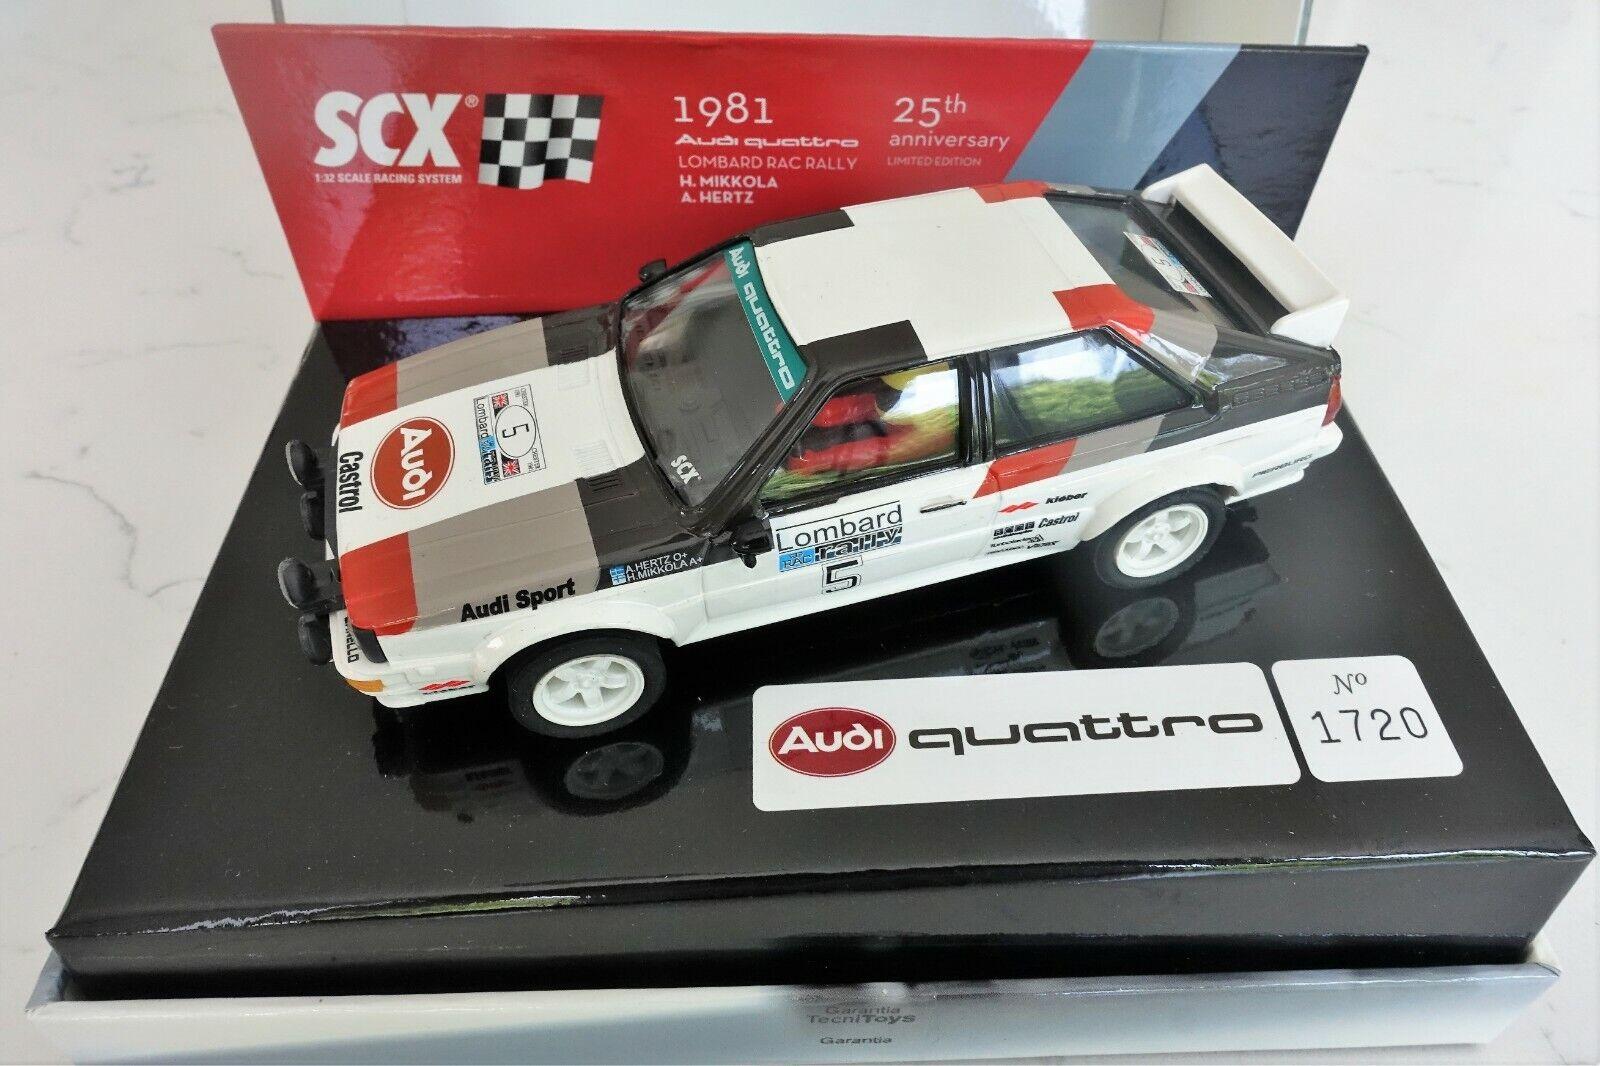 Scx 62330 Audi Quattro 1981 Lombard RAC Rally Ltd Edition Mikkola-Hertz Nuevo Y En Caja